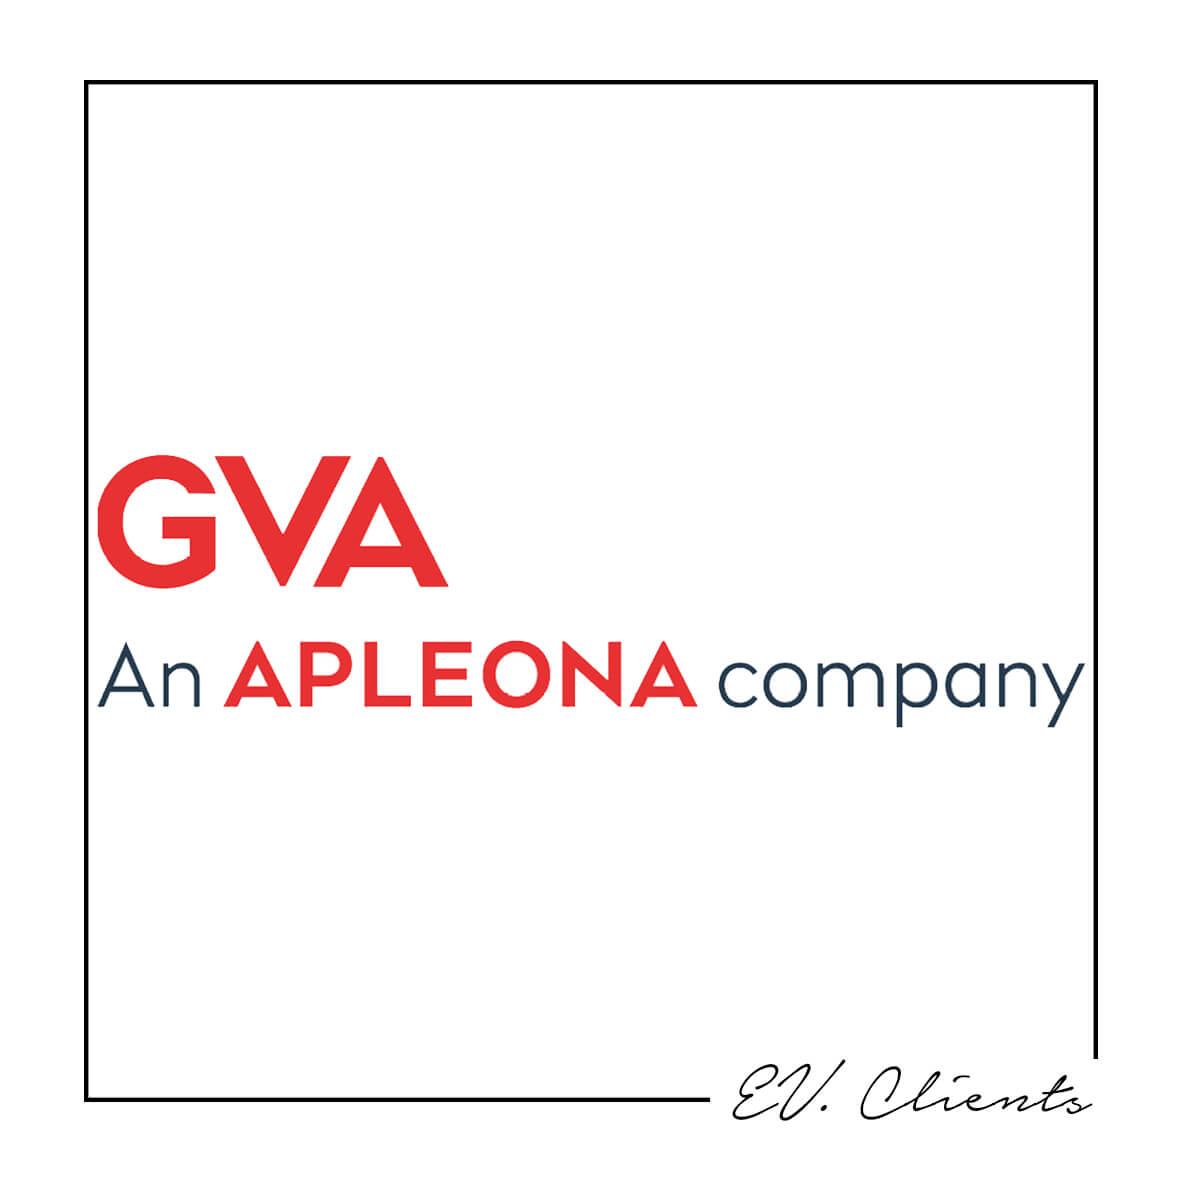 GVA, GVA property